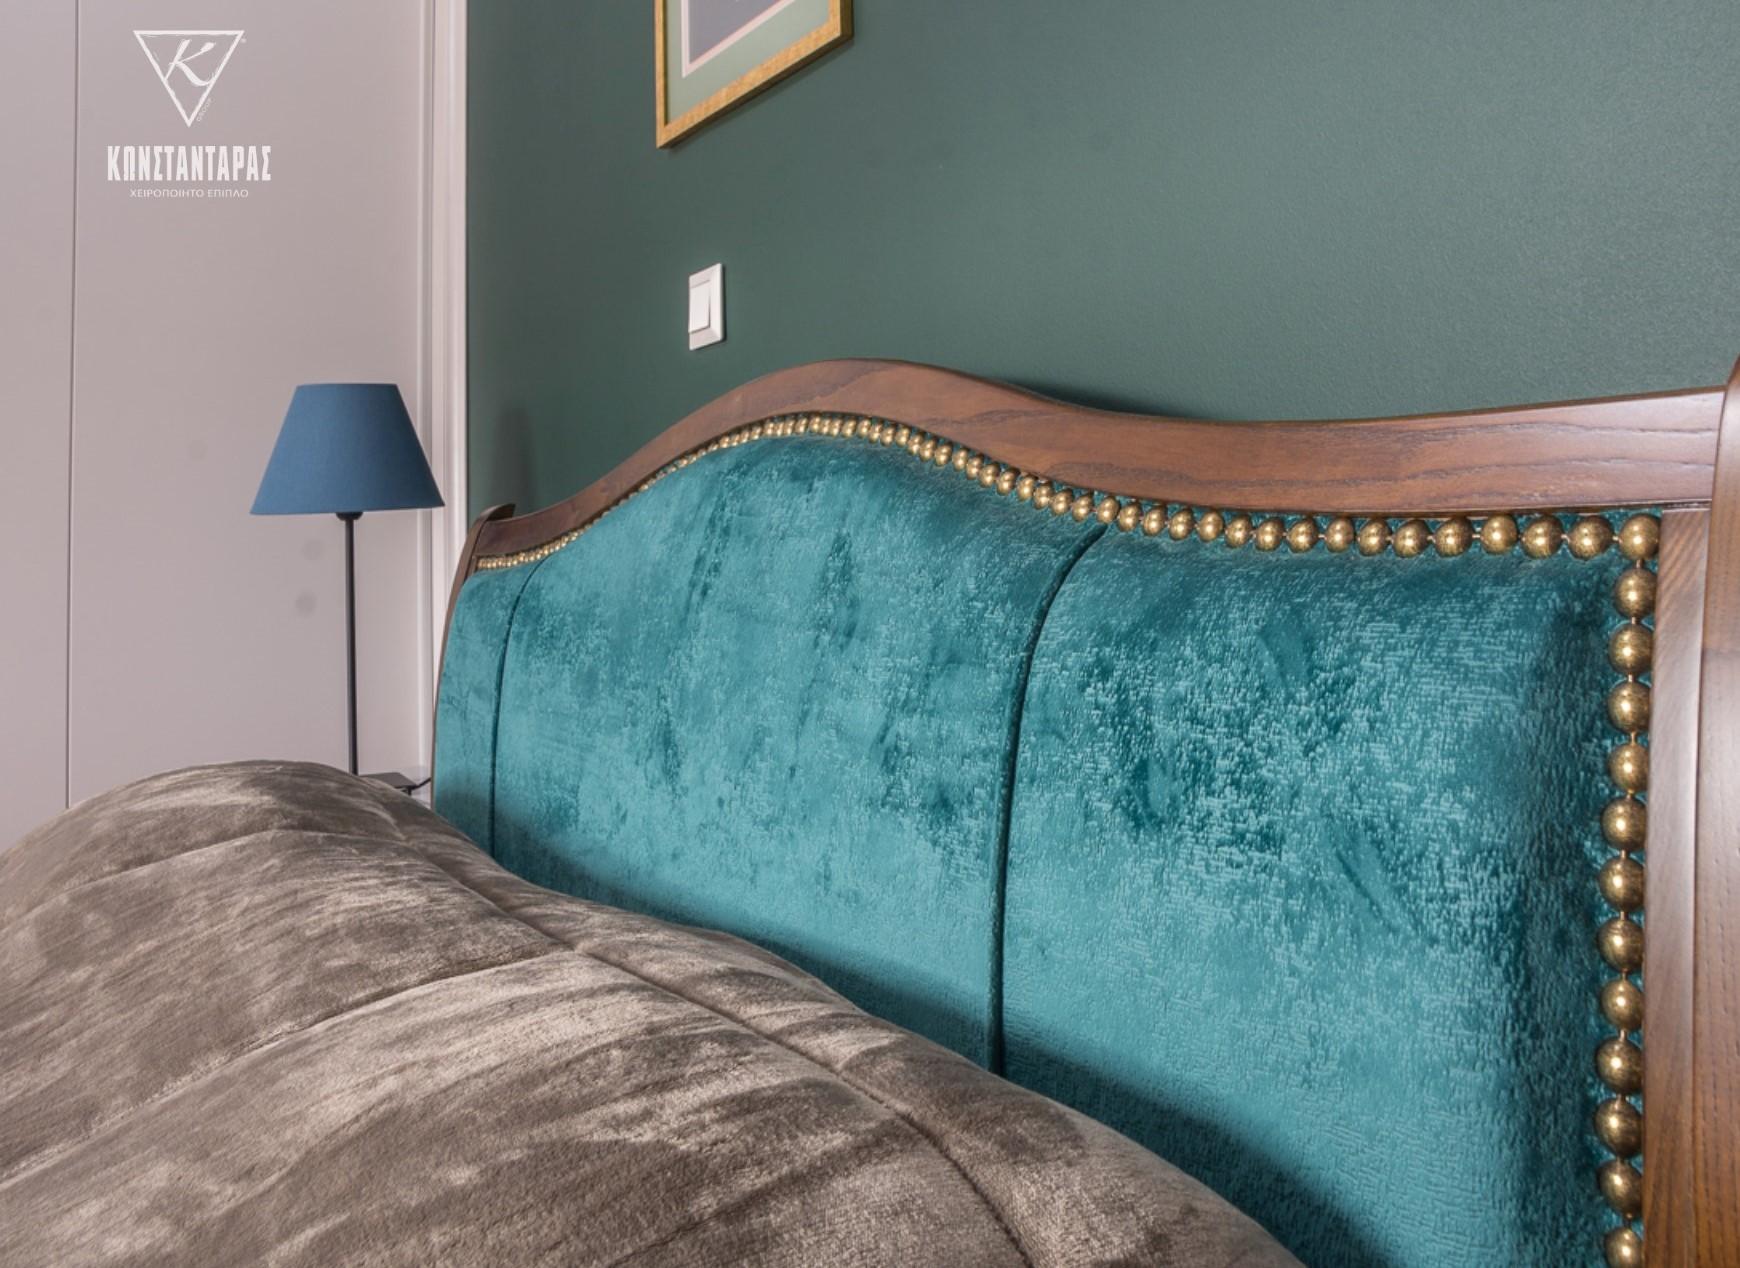 Konstantaras.net - Κρεβάτι Με Γαλάζια Πλάτη